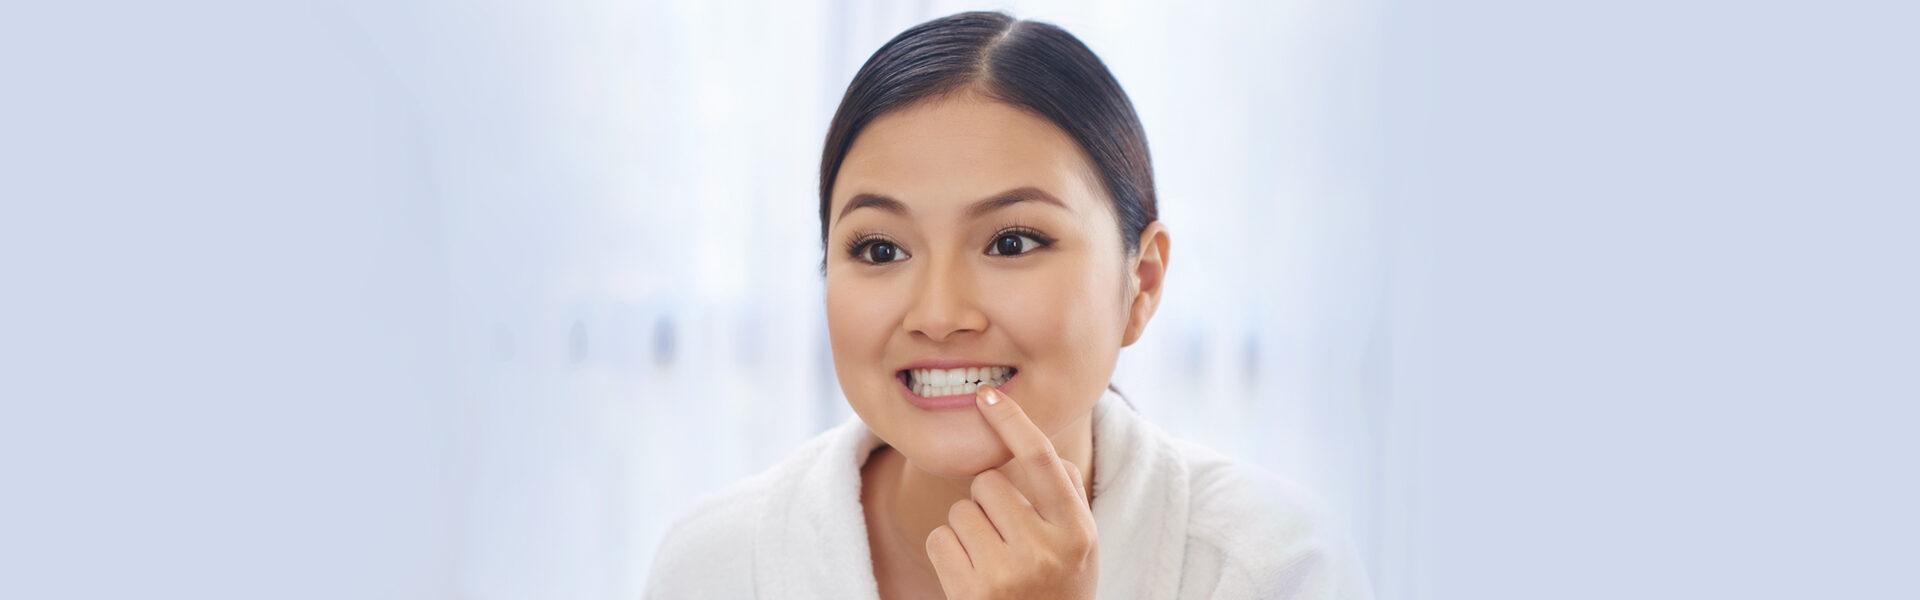 Prosthodontics in Concord, MA